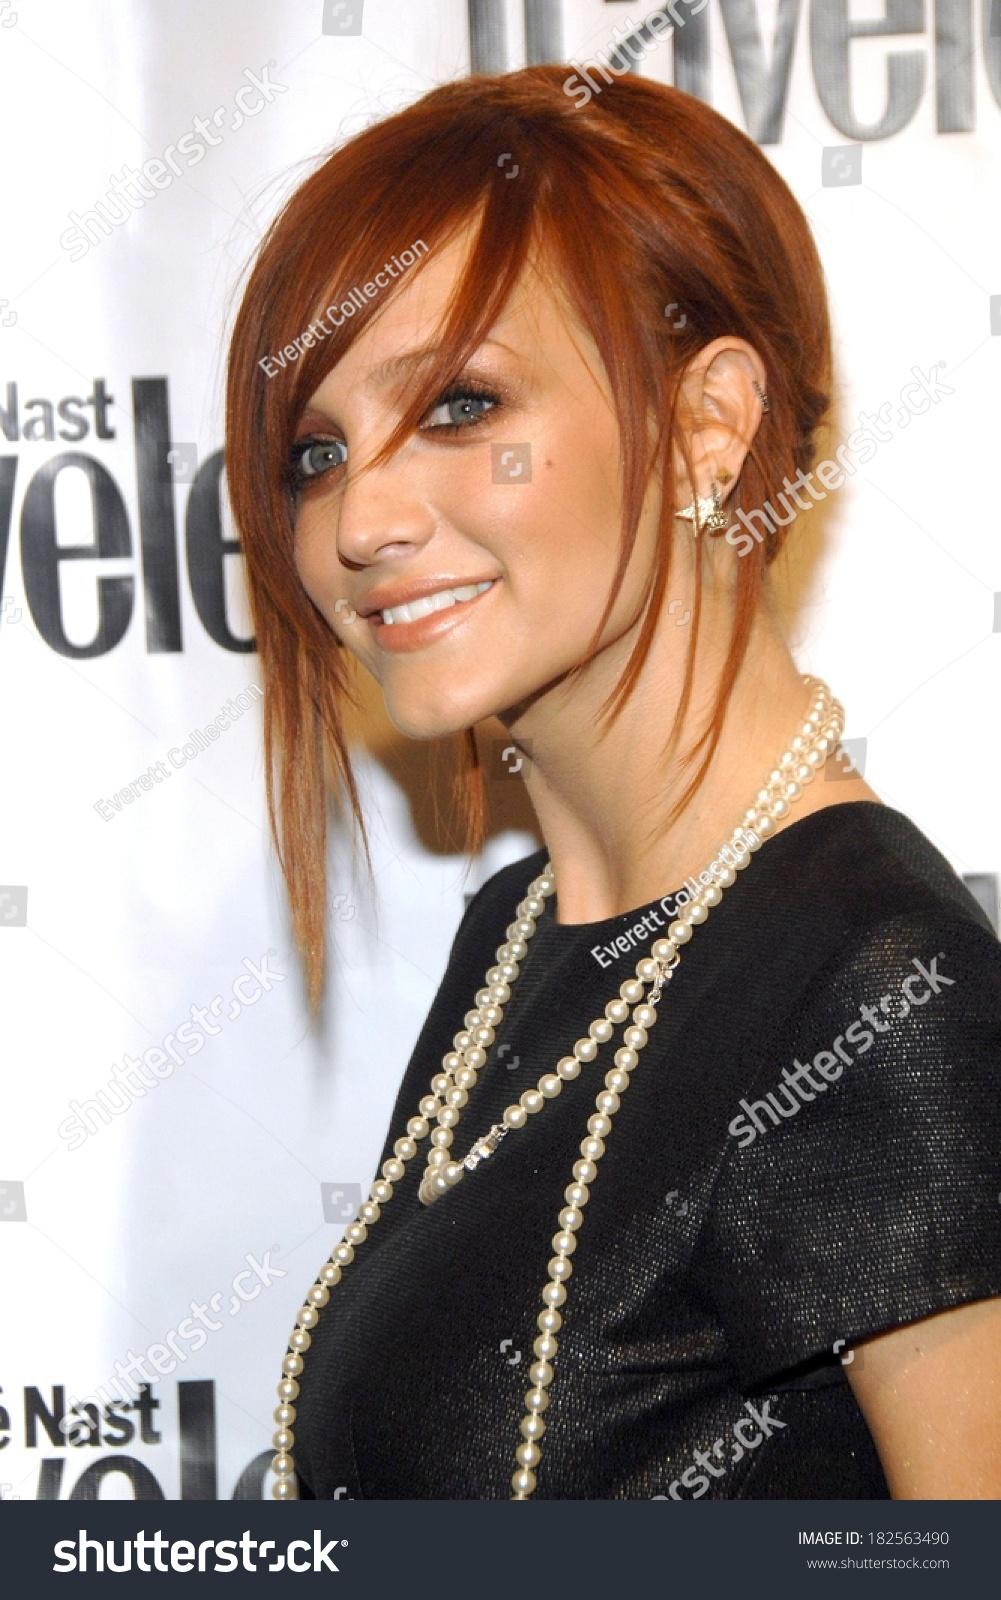 Ashlee Simpson Chanel Necklace Chanel Starshaped Stock Photo Edit